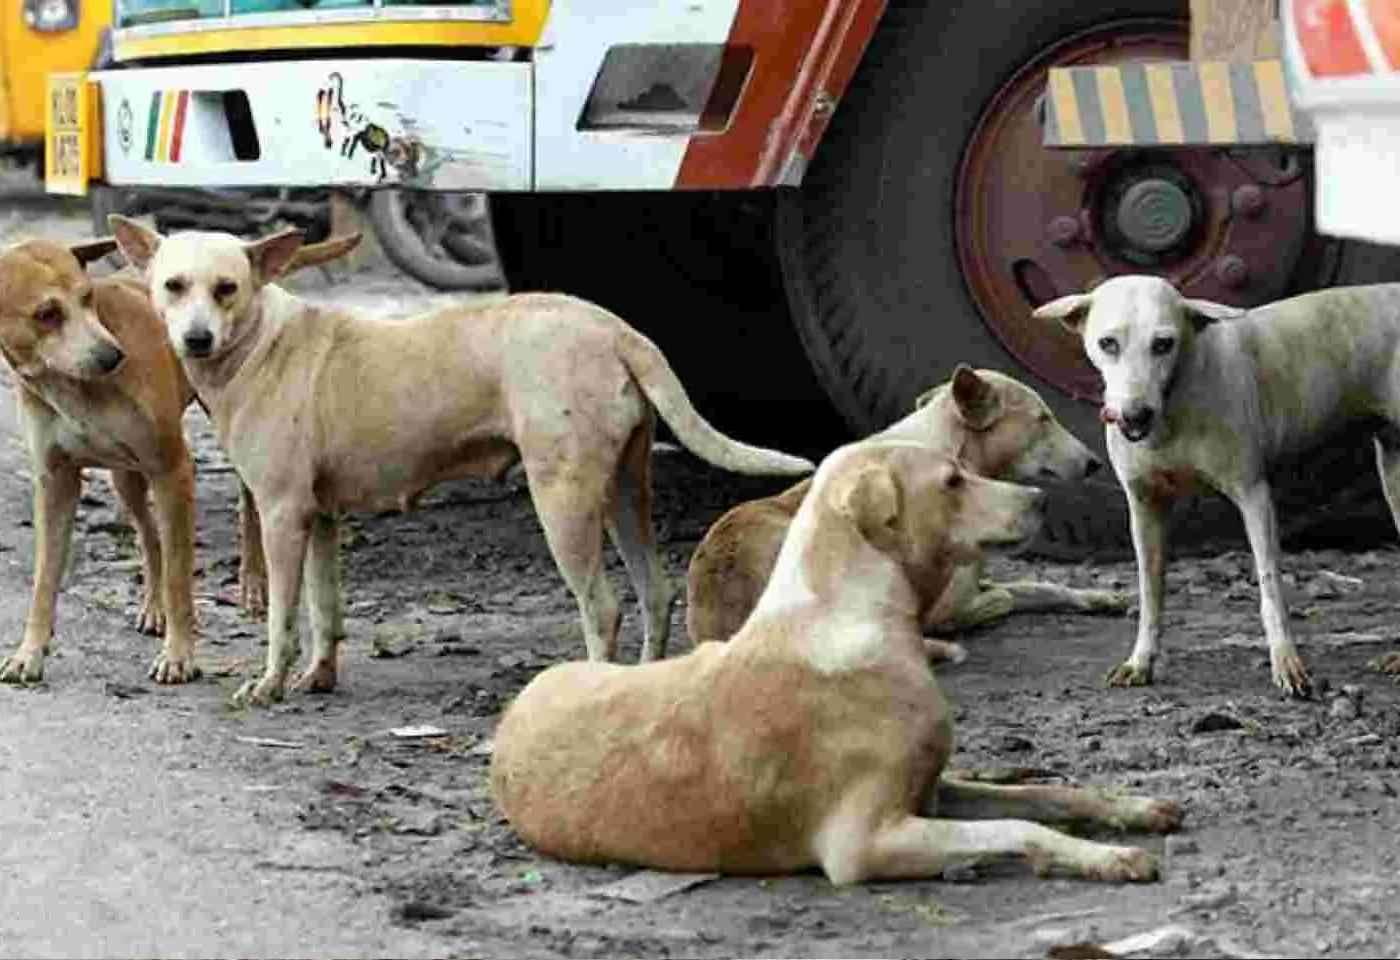 150 dogs burried alive in shivamogga karnataka Reports